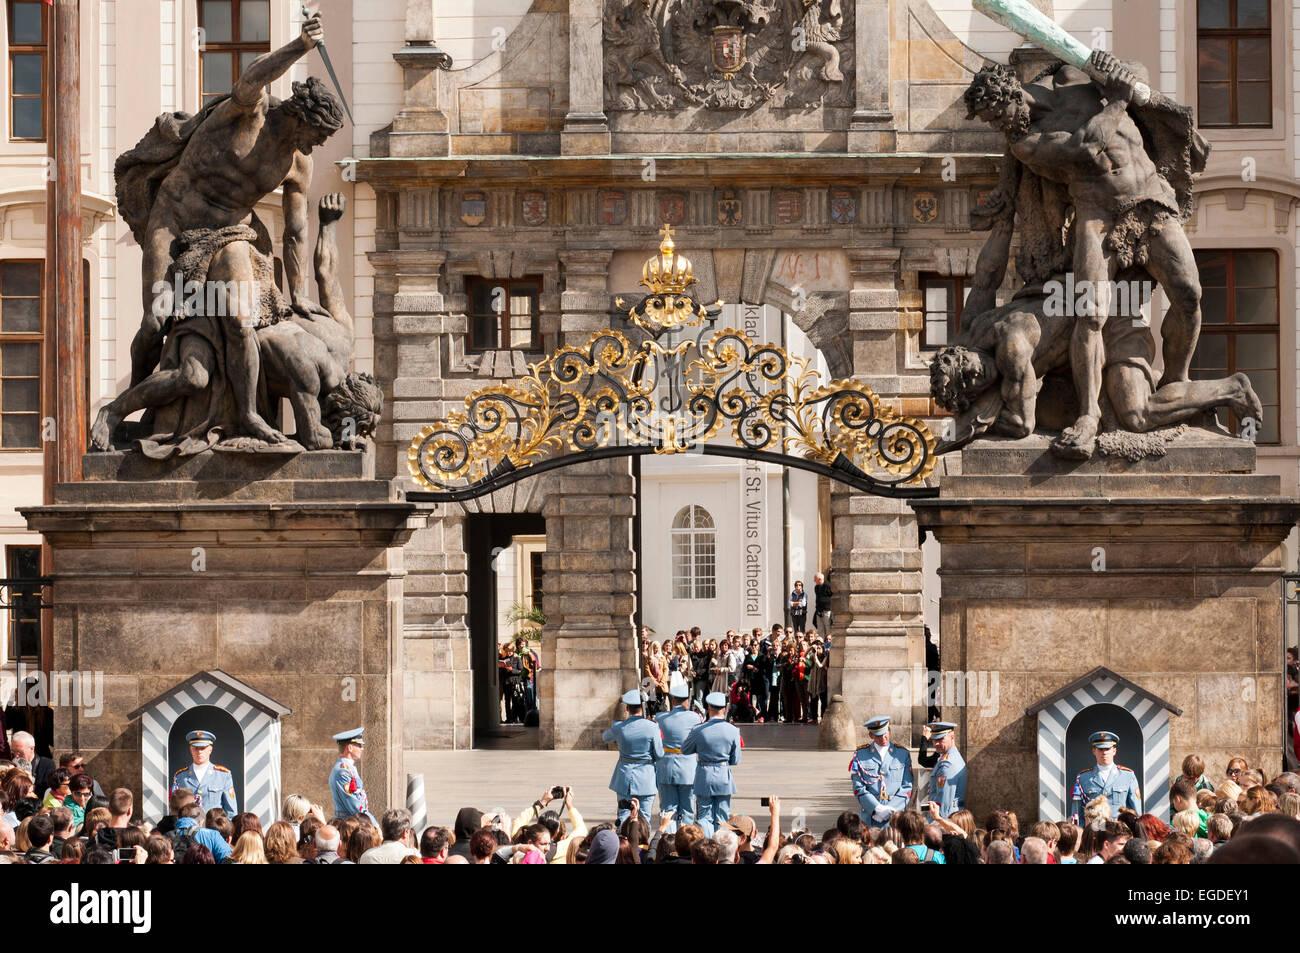 Changing of the guard at Prague Castle, Prague, Czech Republic, Europe - Stock Image